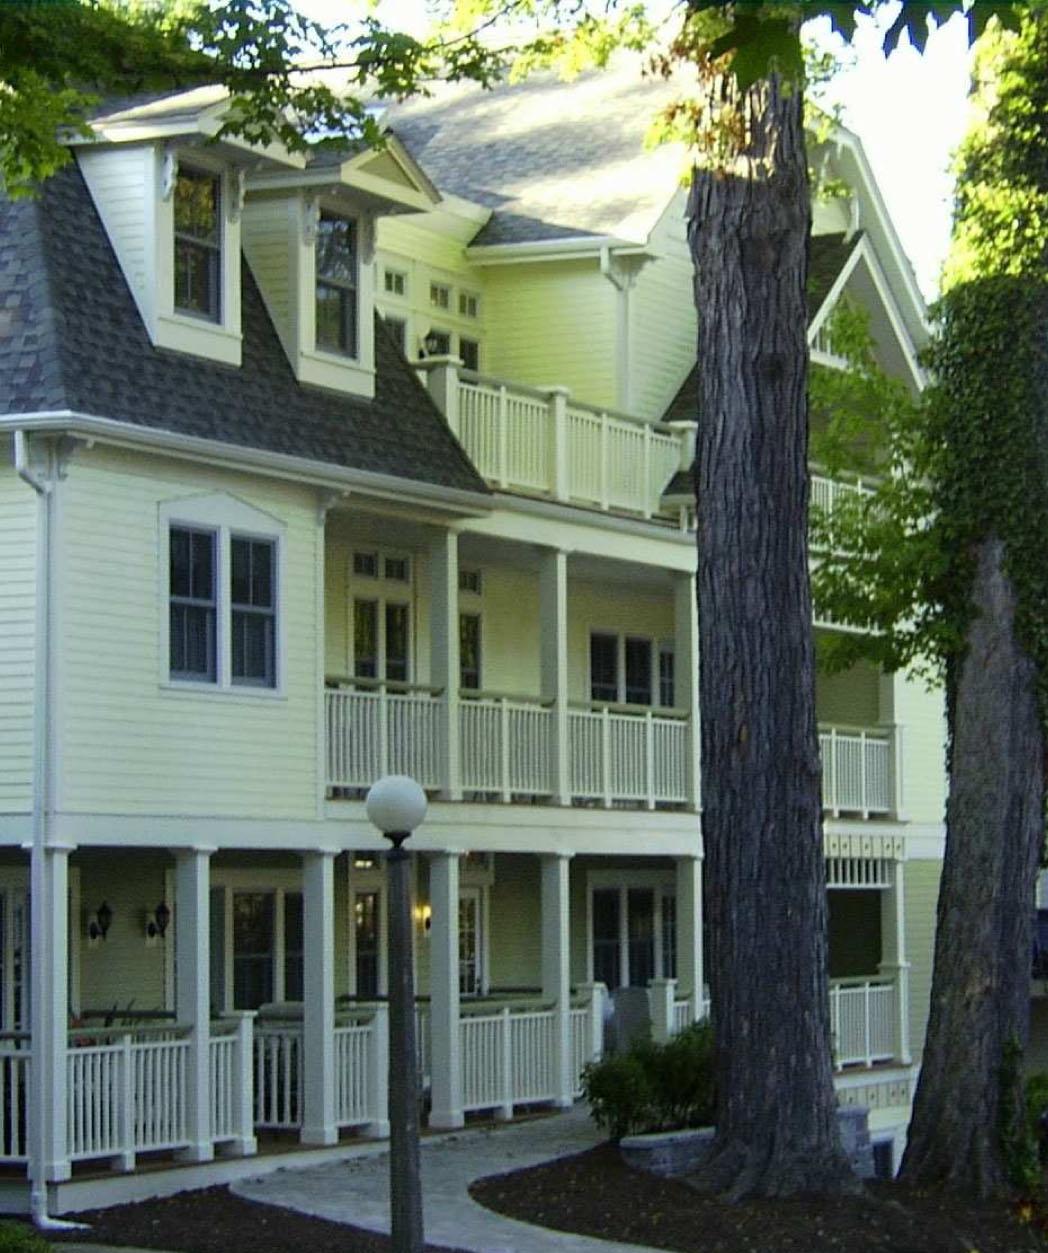 Penn Arms Condominiums